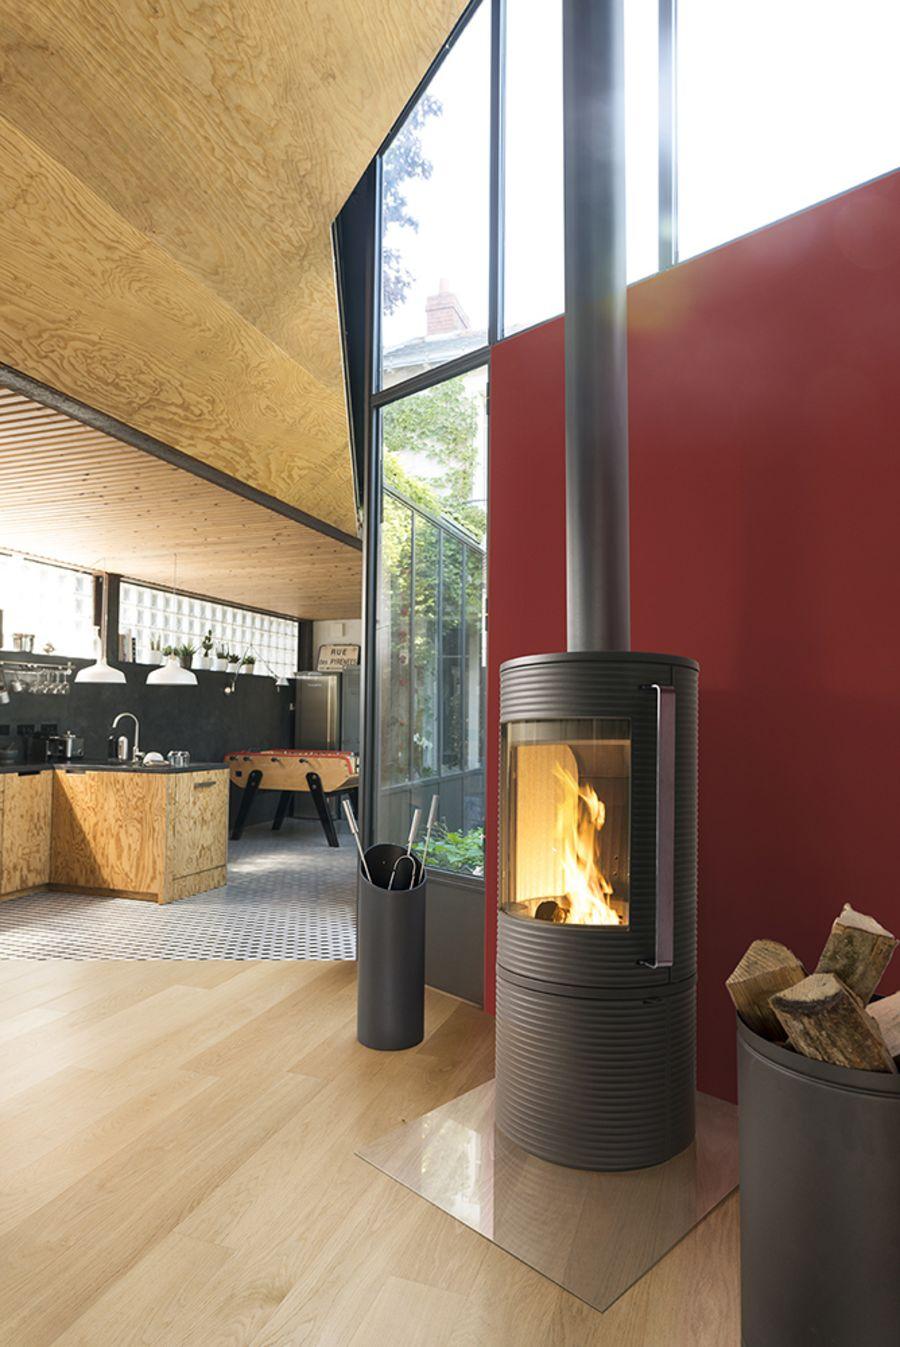 Invicta Altara + Ecodesign 2022 Cast Iron Woodburning Stove